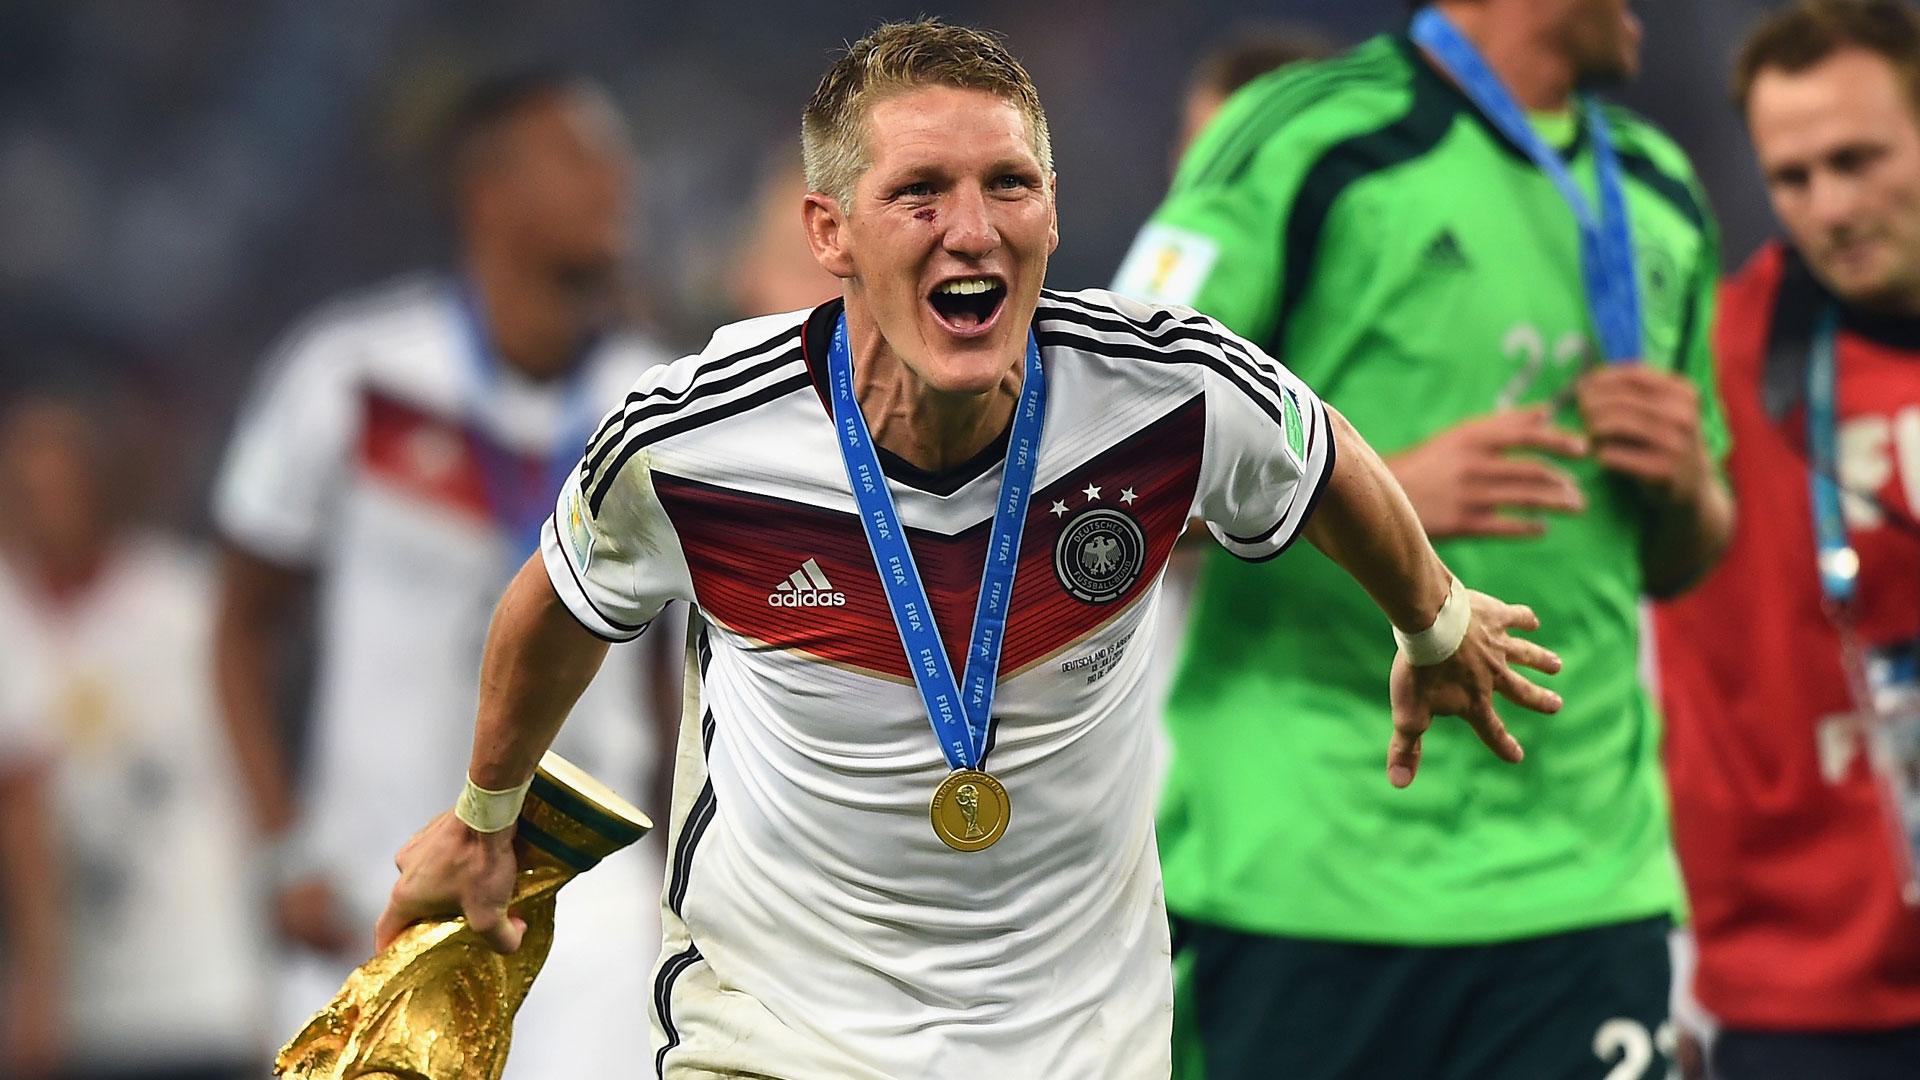 Allemagne - Joachim Löw rend hommage à Bastian Schweinsteiger